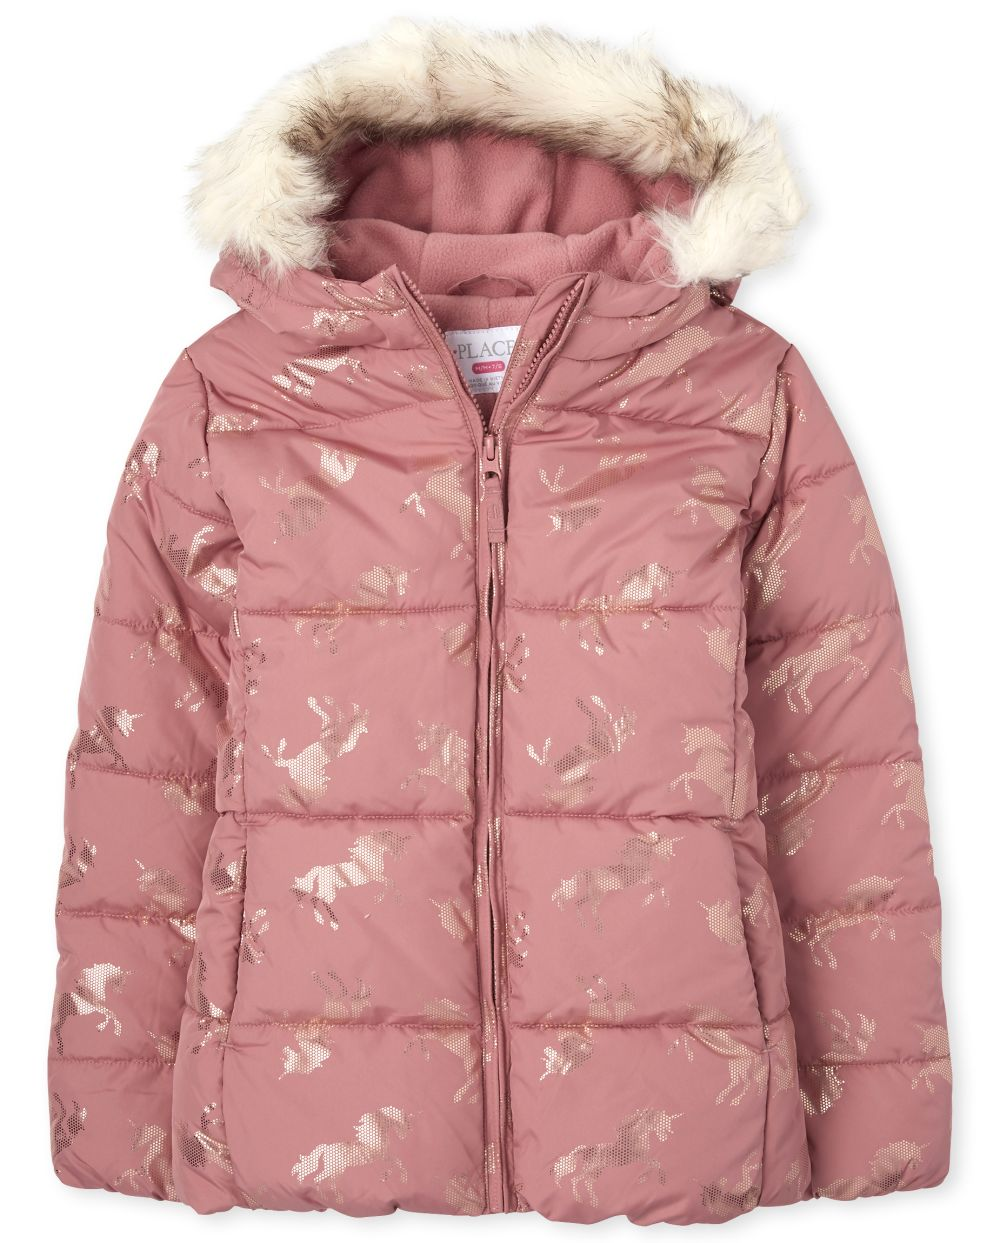 Girls Foil Unicorn Puffer Jacket